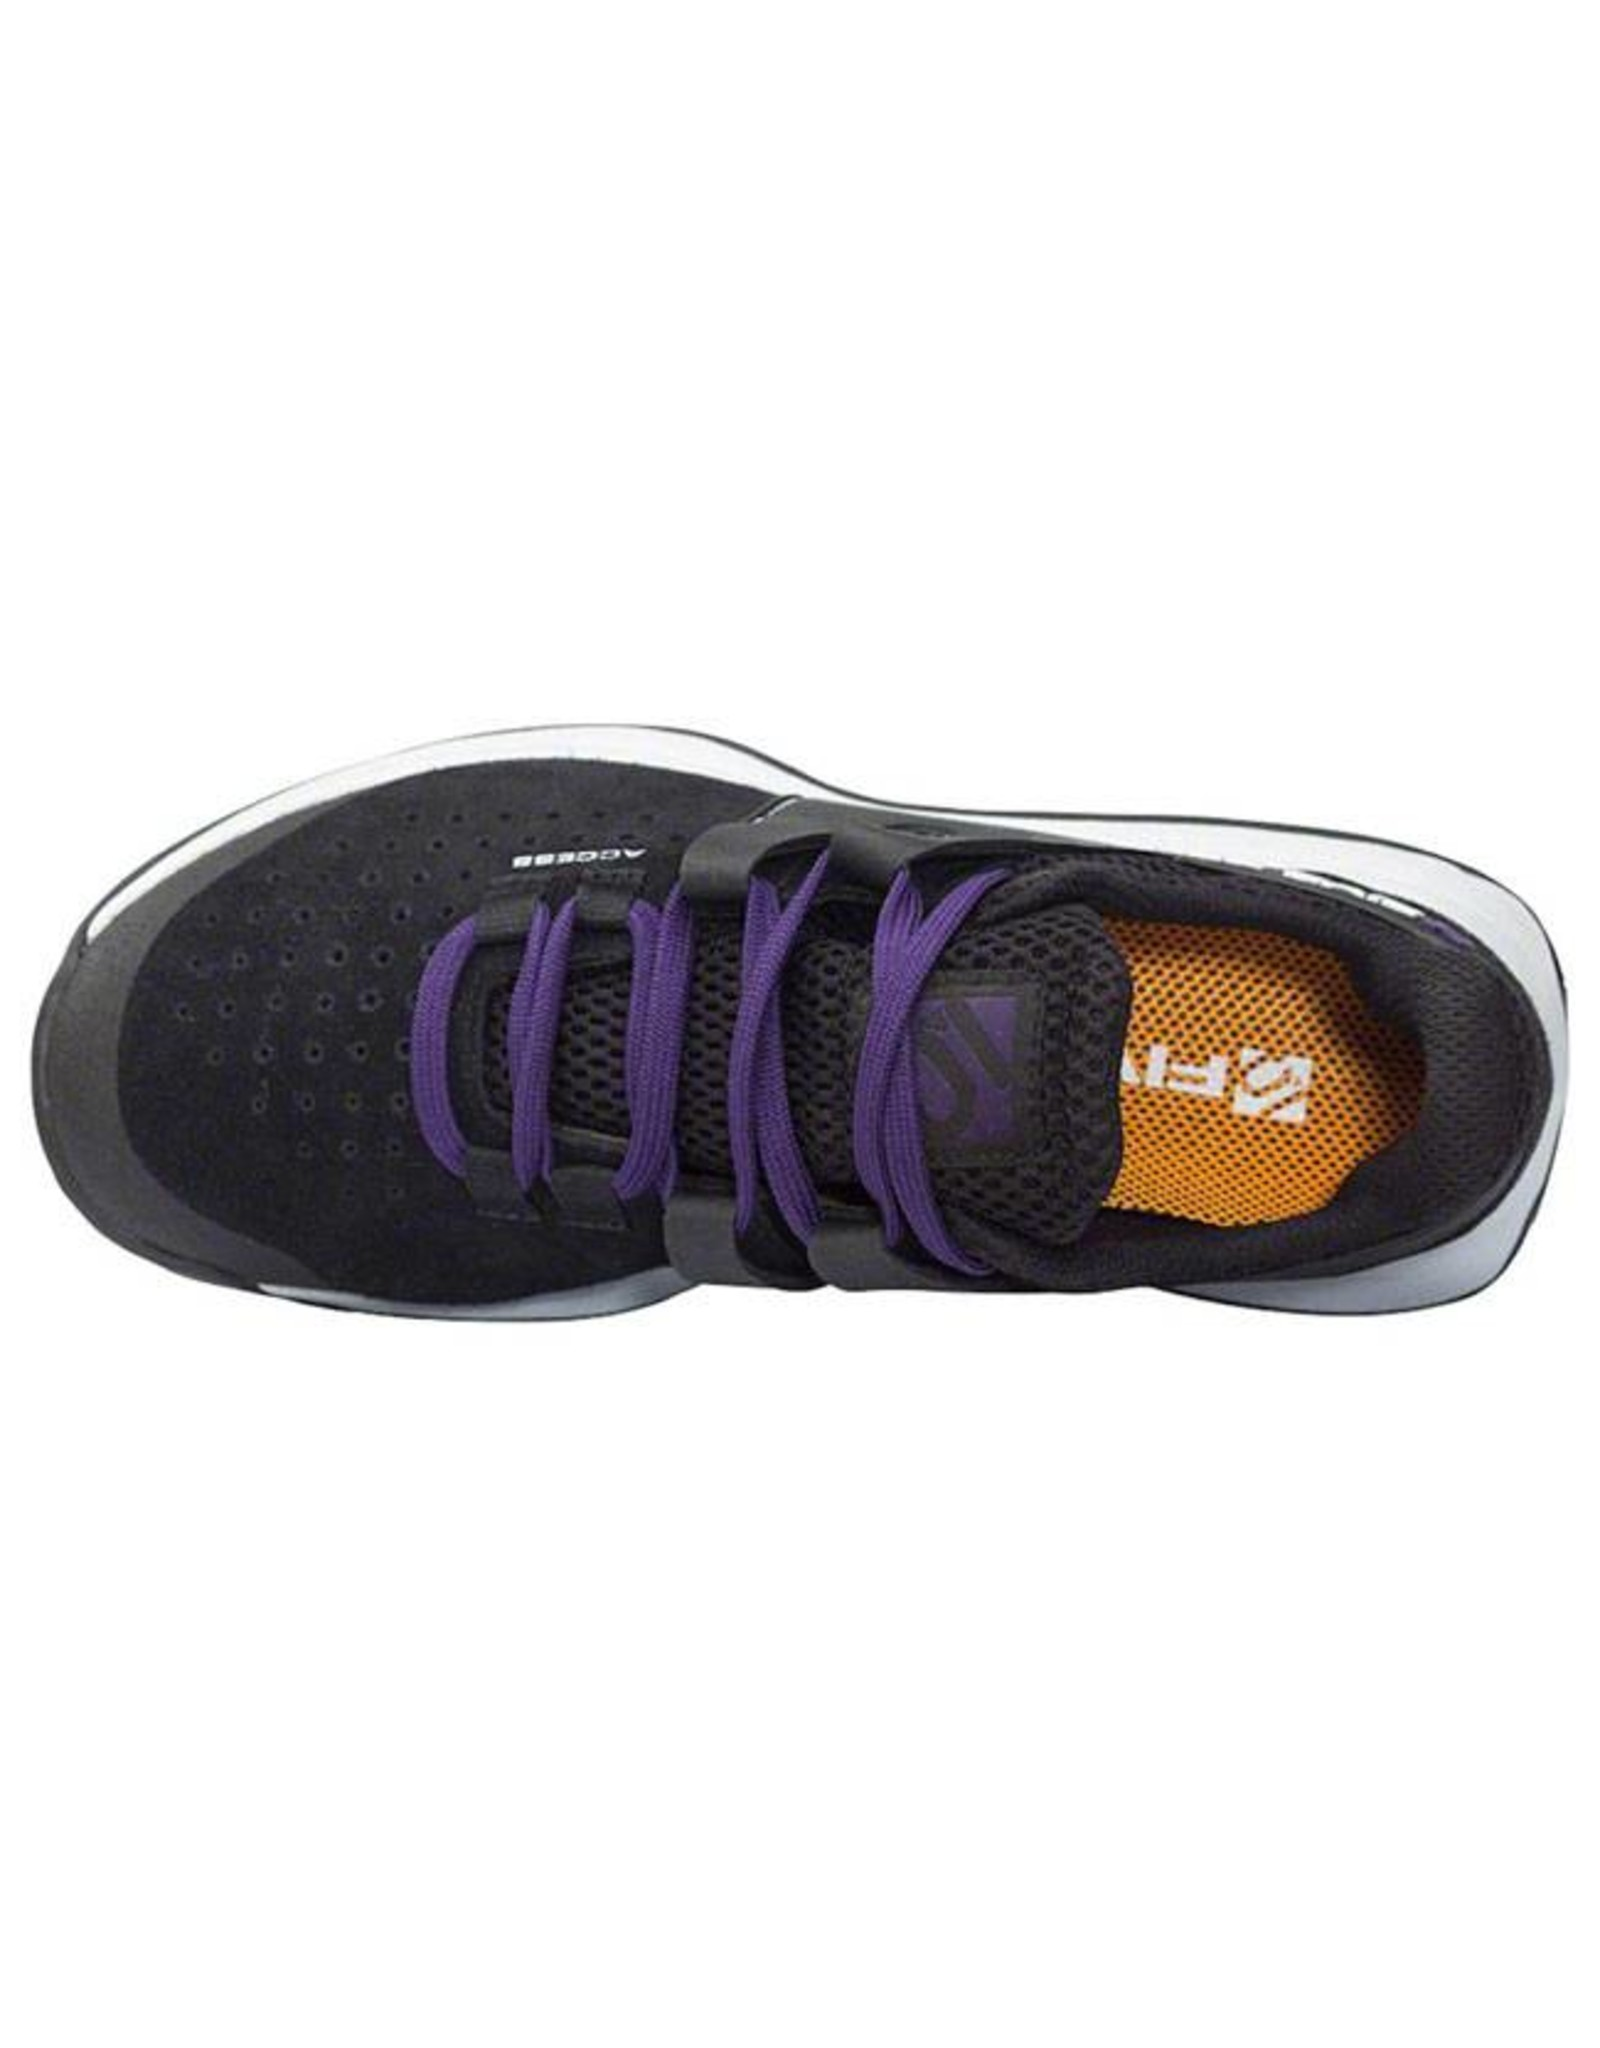 Five Ten Five Ten Access Women's Approach Shoe: Gray 7